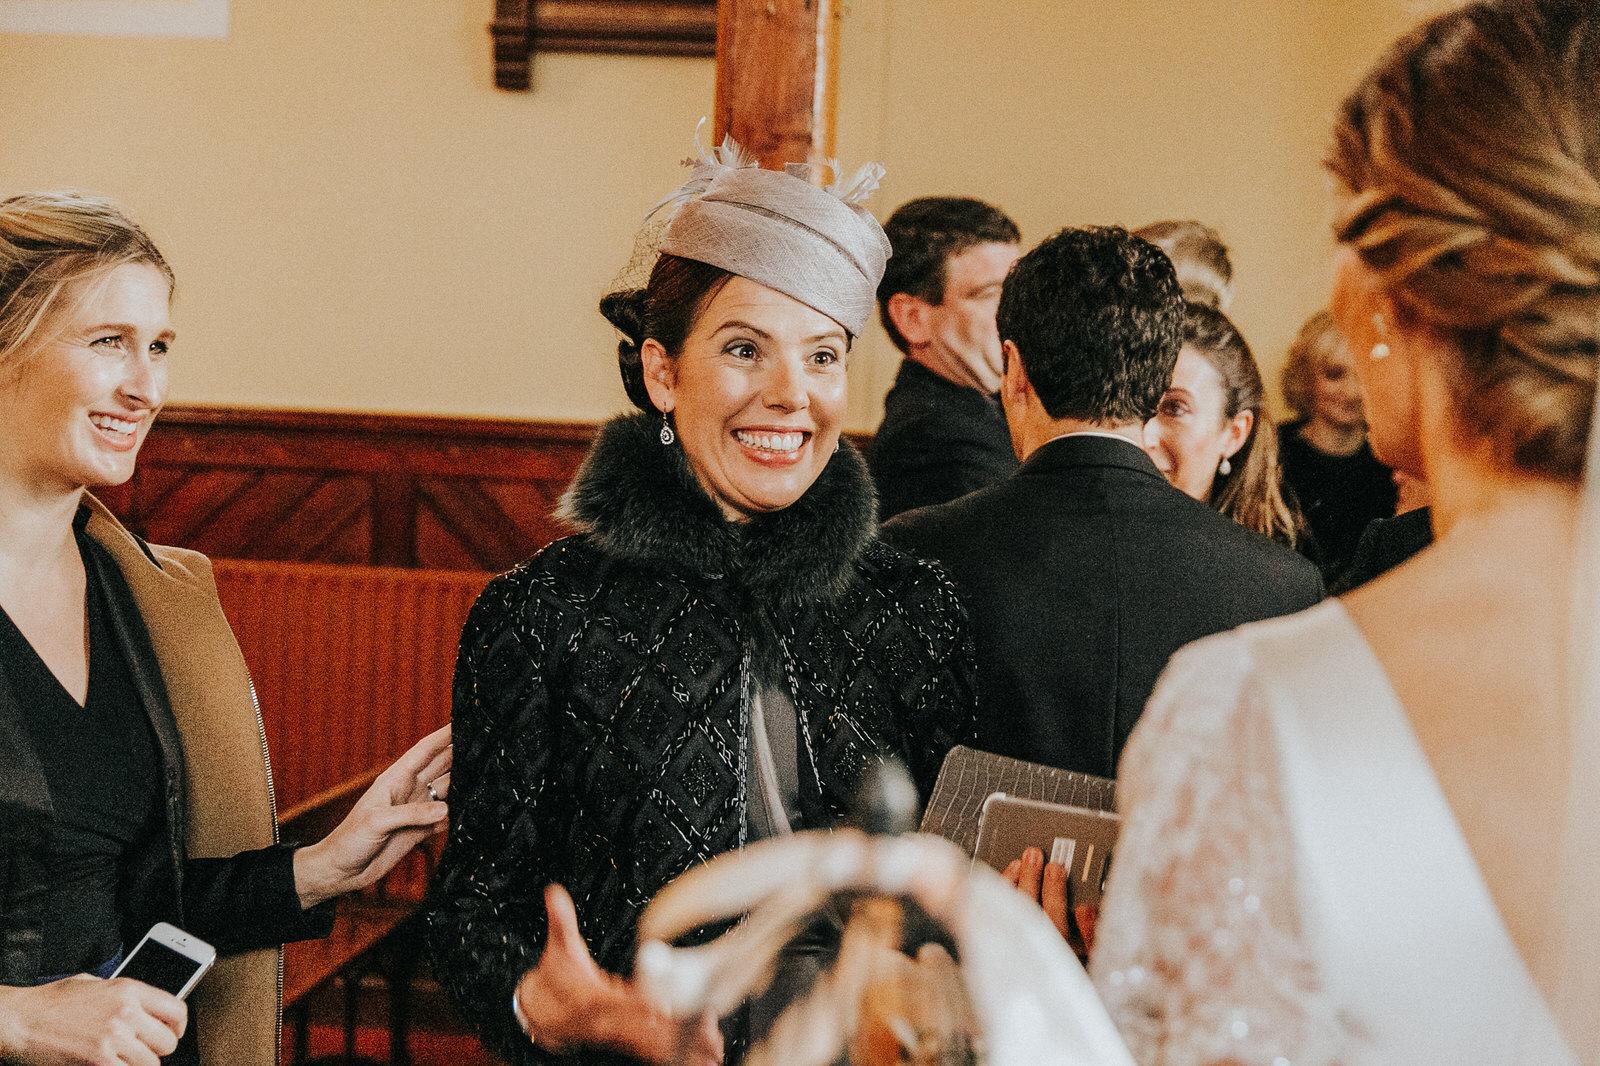 Dunbrody_House_Wedding_photographer_081.jpg